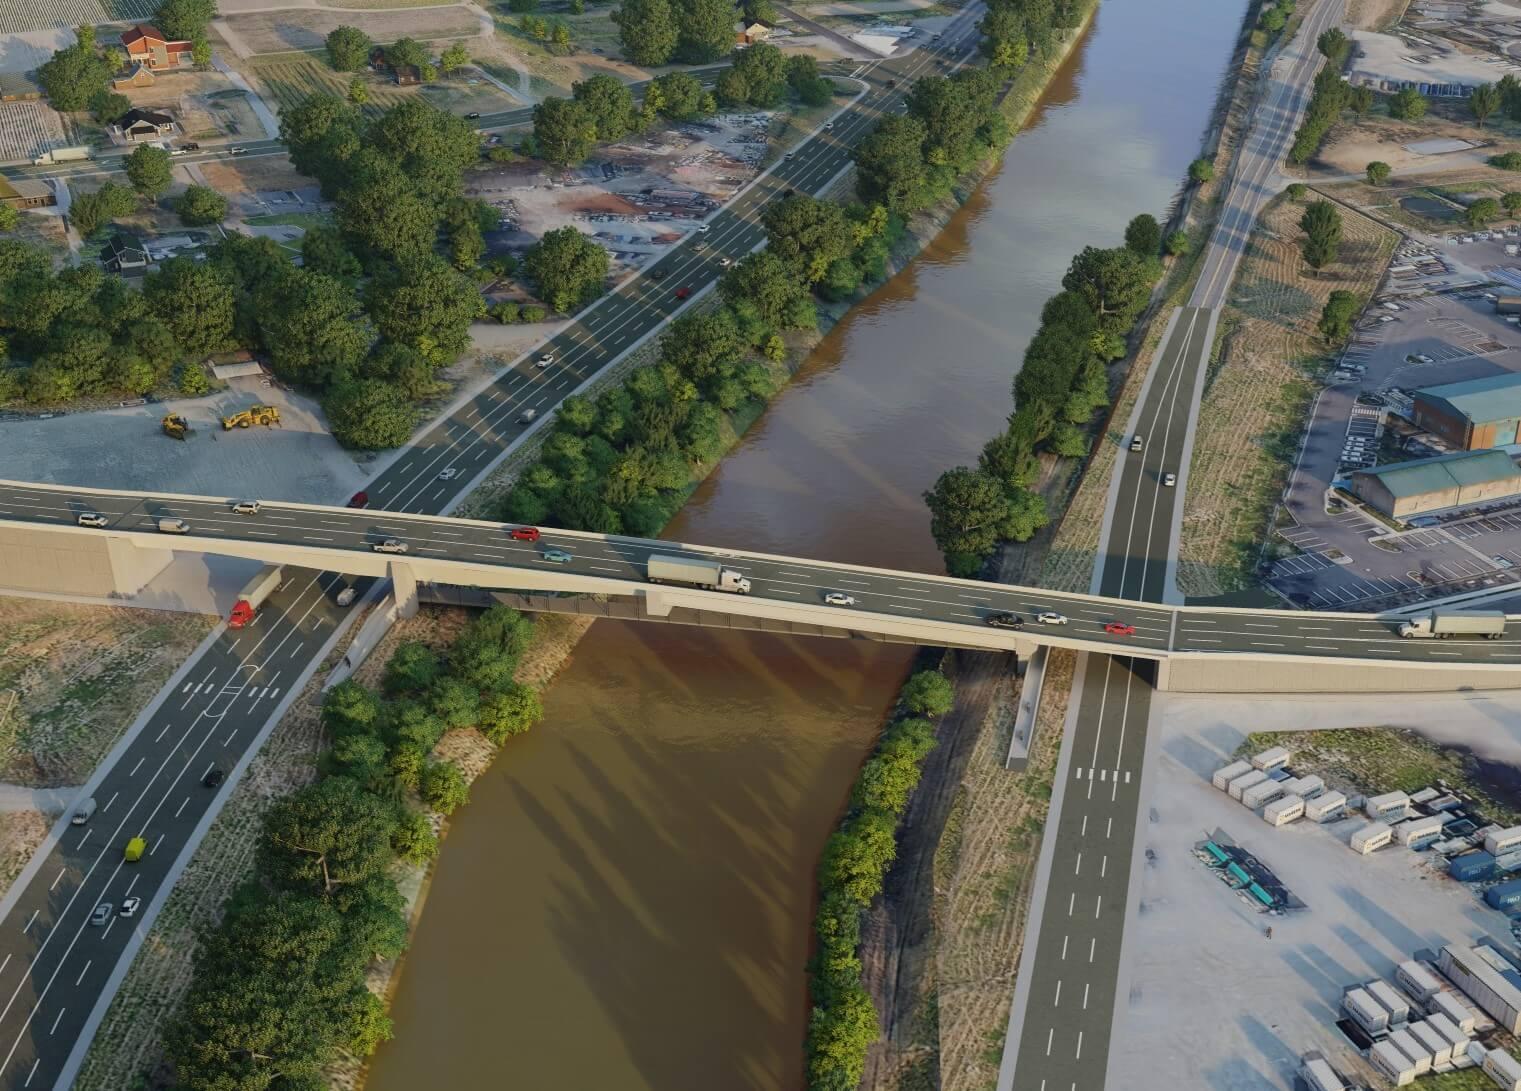 Visualization of the future bridge over the Puyallup River